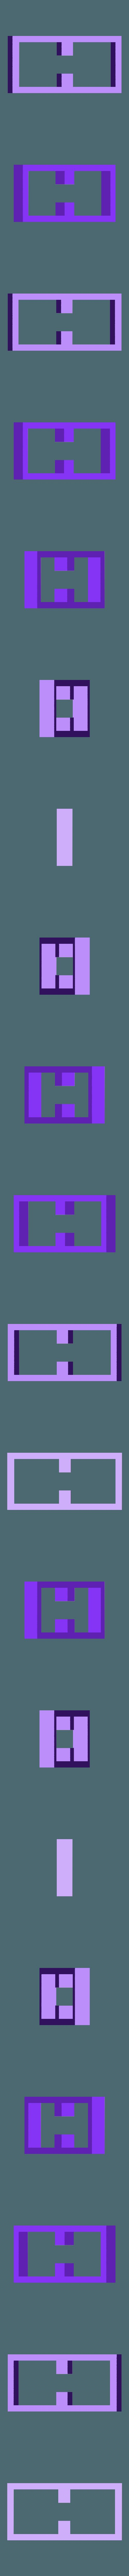 settler-box-half.stl Download free STL file Catan Card Game Inlay / Card Box • 3D printer design, plokr